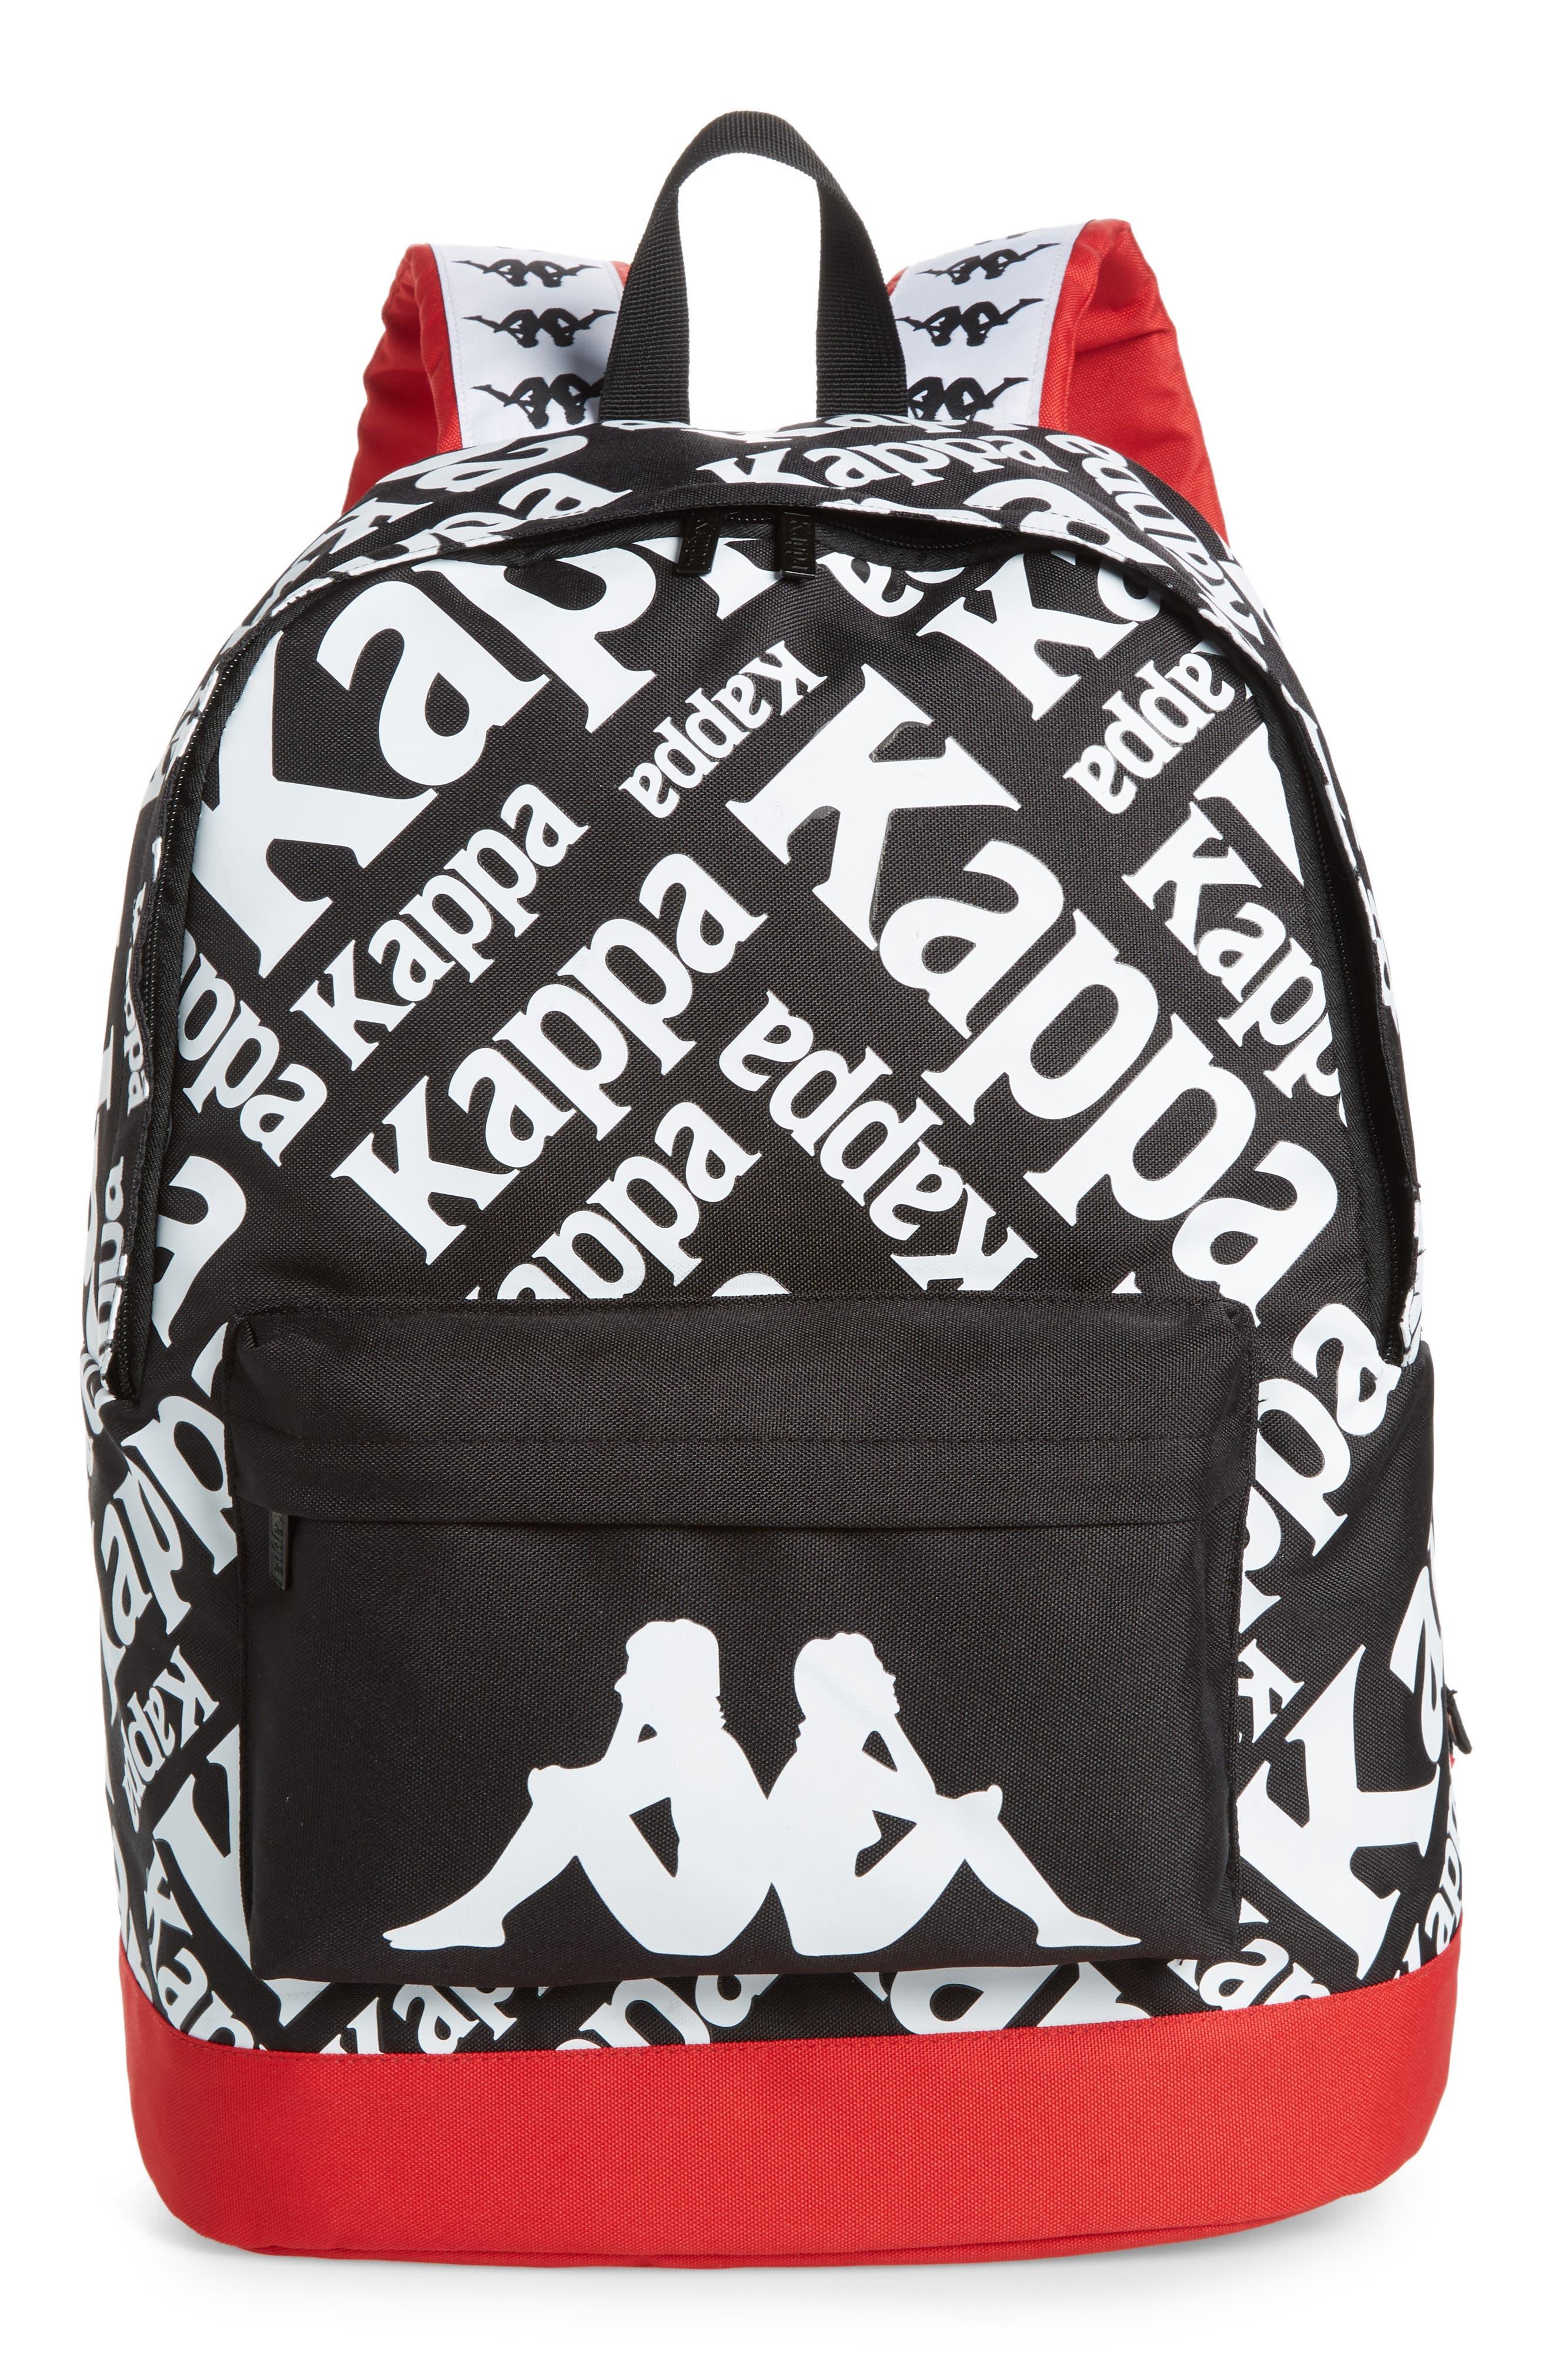 Kappa Active Backpack - Black